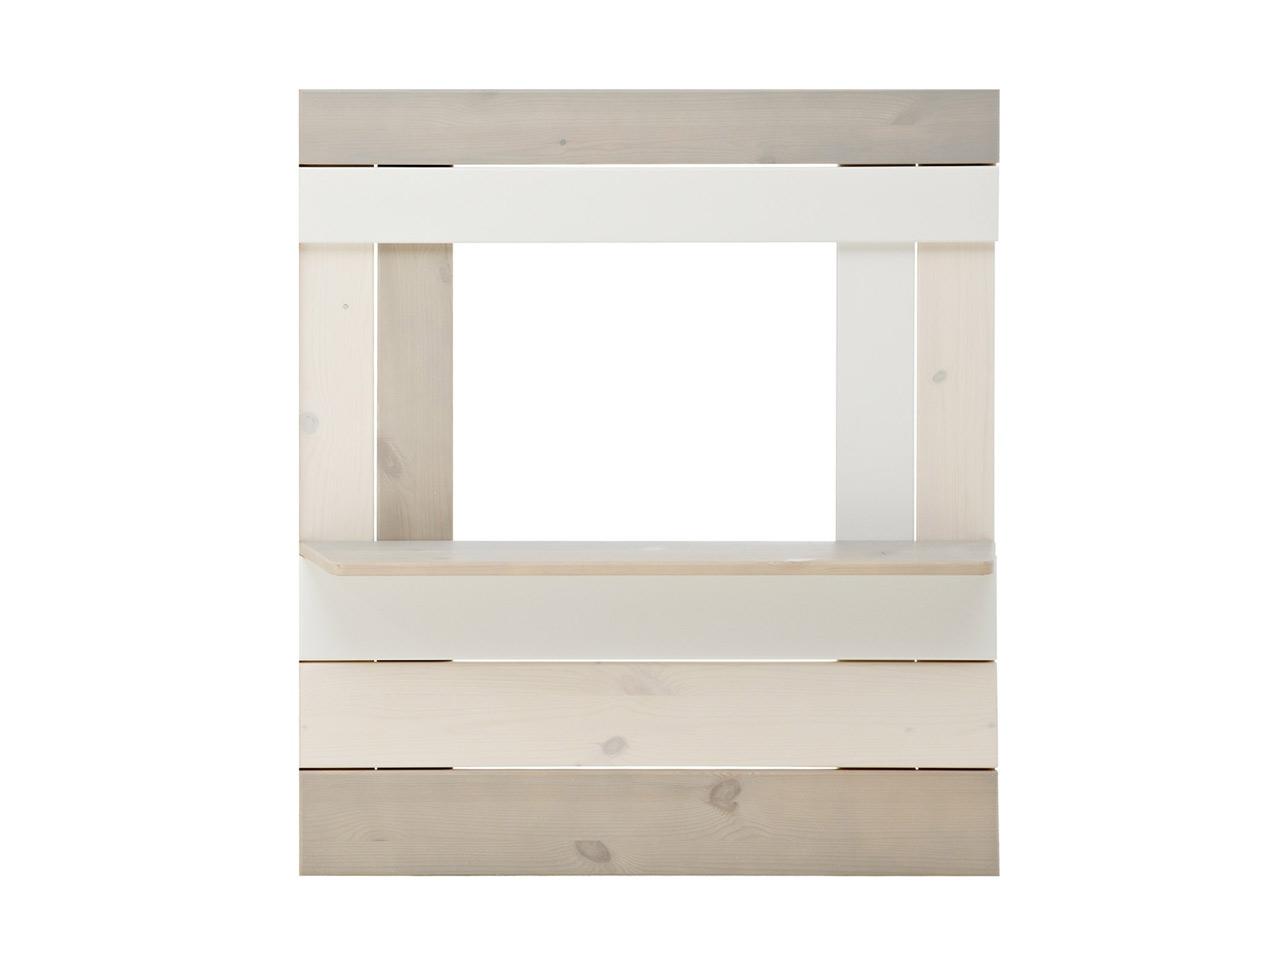 paneele online kaufen soldberg. Black Bedroom Furniture Sets. Home Design Ideas